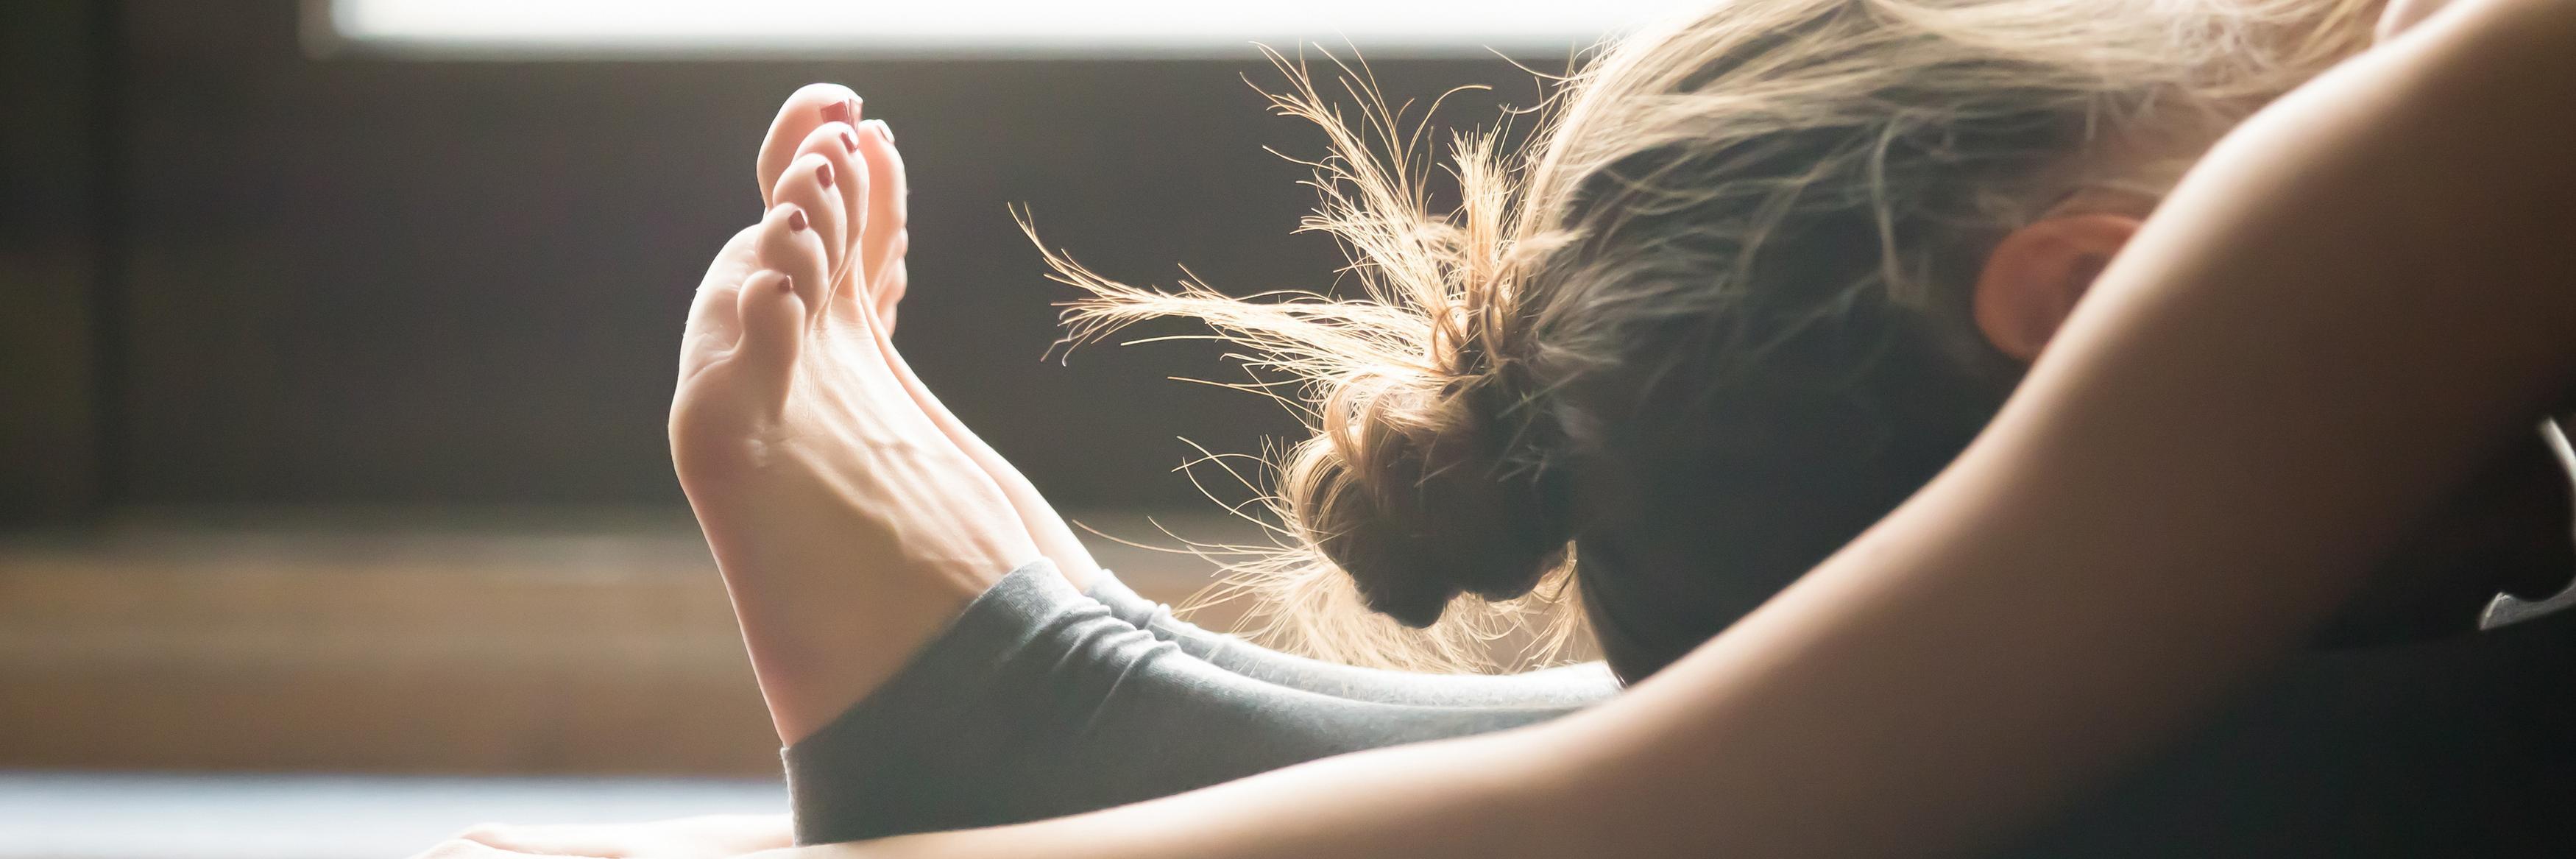 Yin Yoga Special – Rückzug und Regeneration